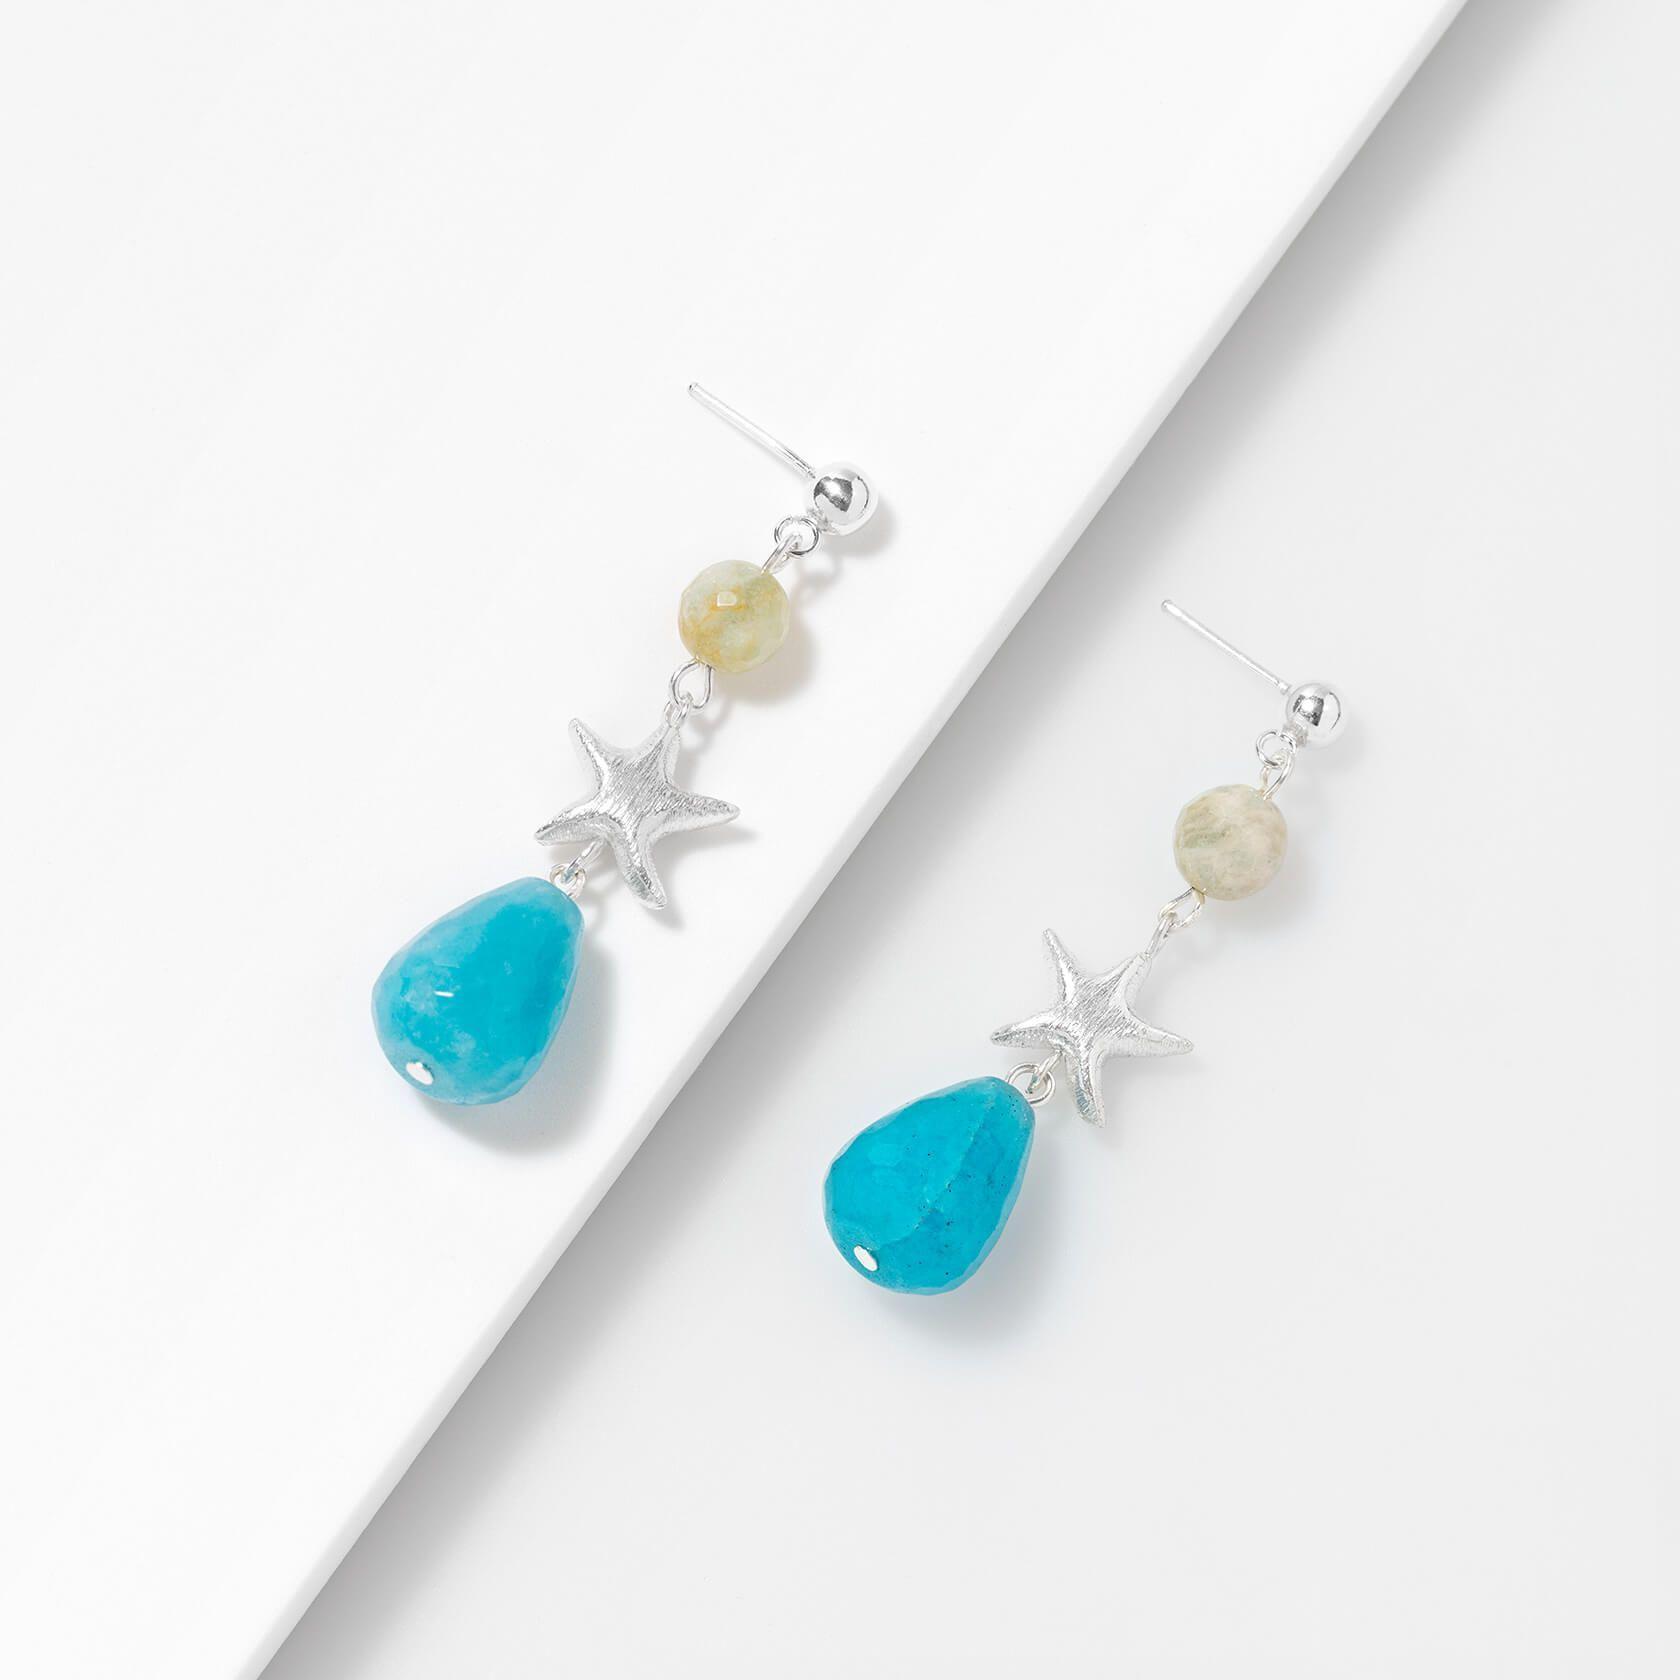 pendientes-cuarzo-azul-aguamarina-capri-estrella